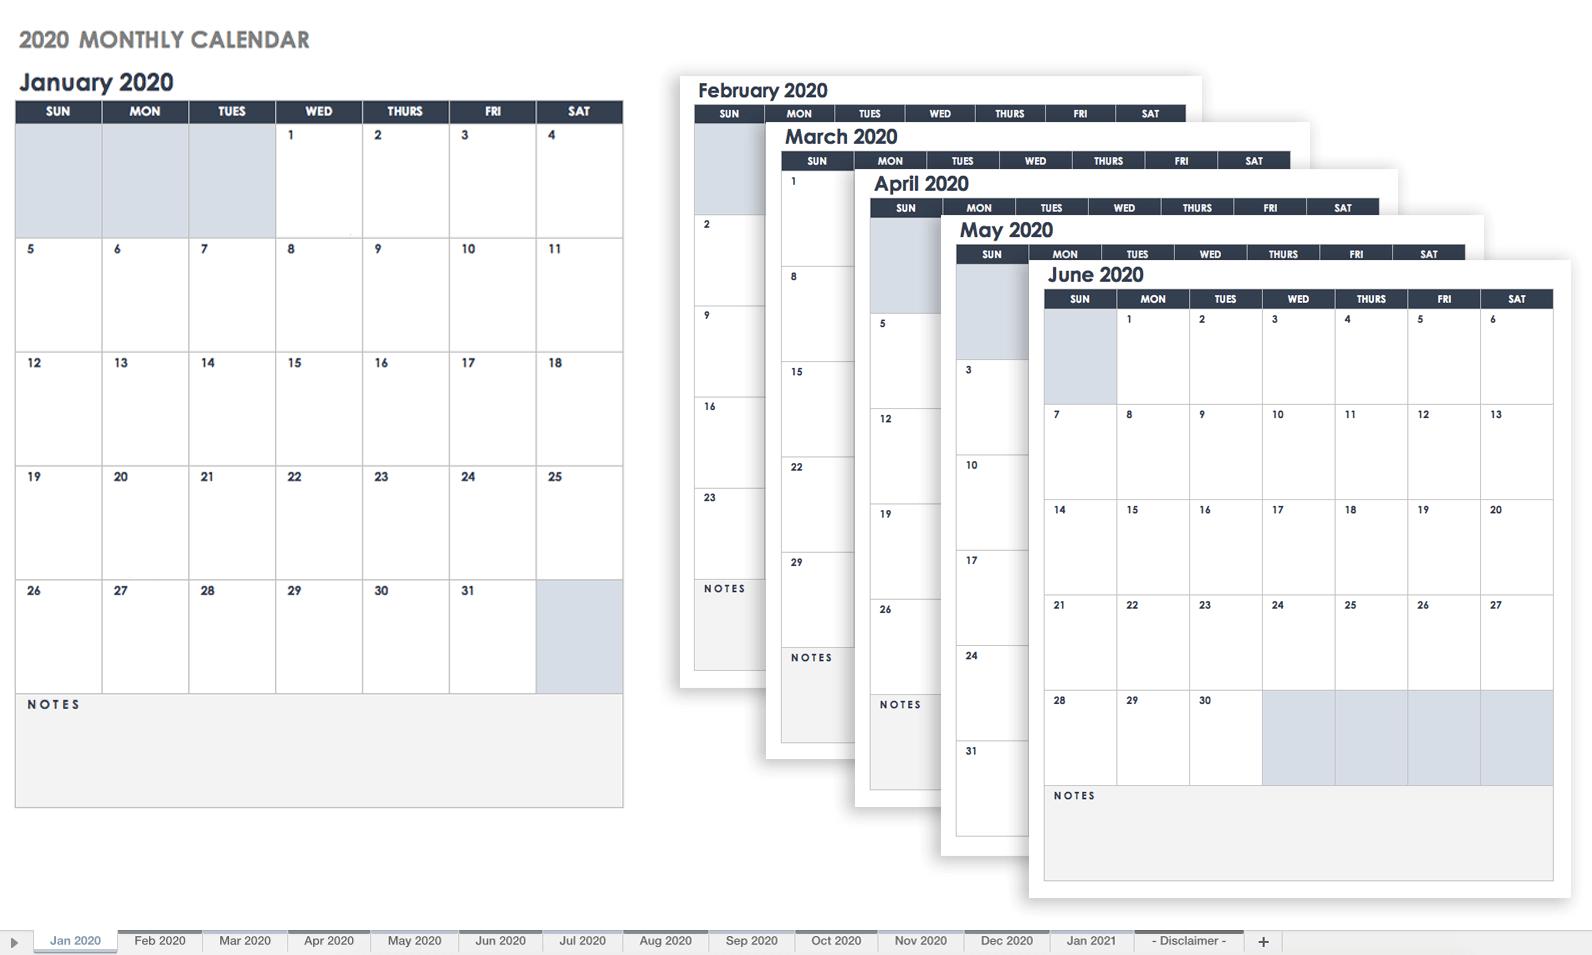 Free Google Calendar Templates | Smartsheet inside 2019-2020 Blank Calendar To Print